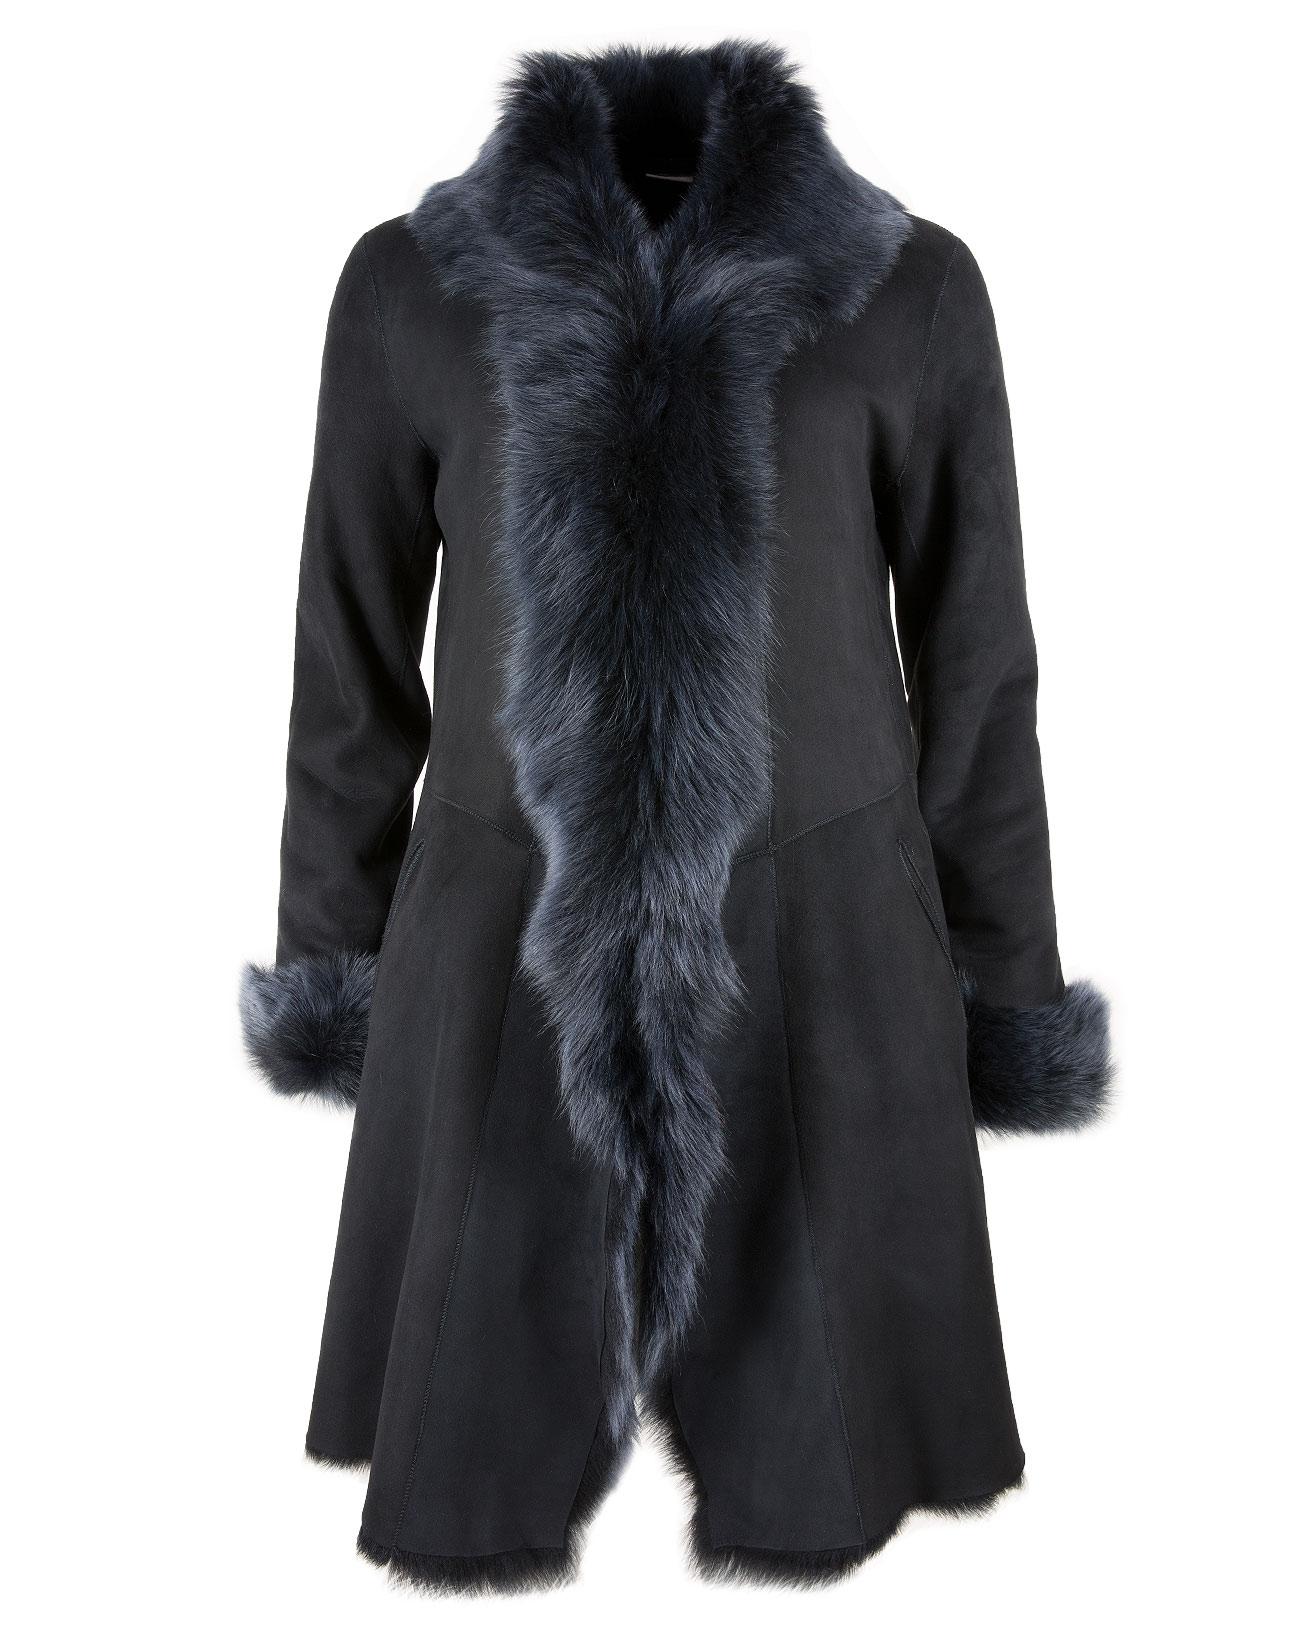 3/4 Toscana Trim Coat - Size 10 - Midnight Blue - 1145